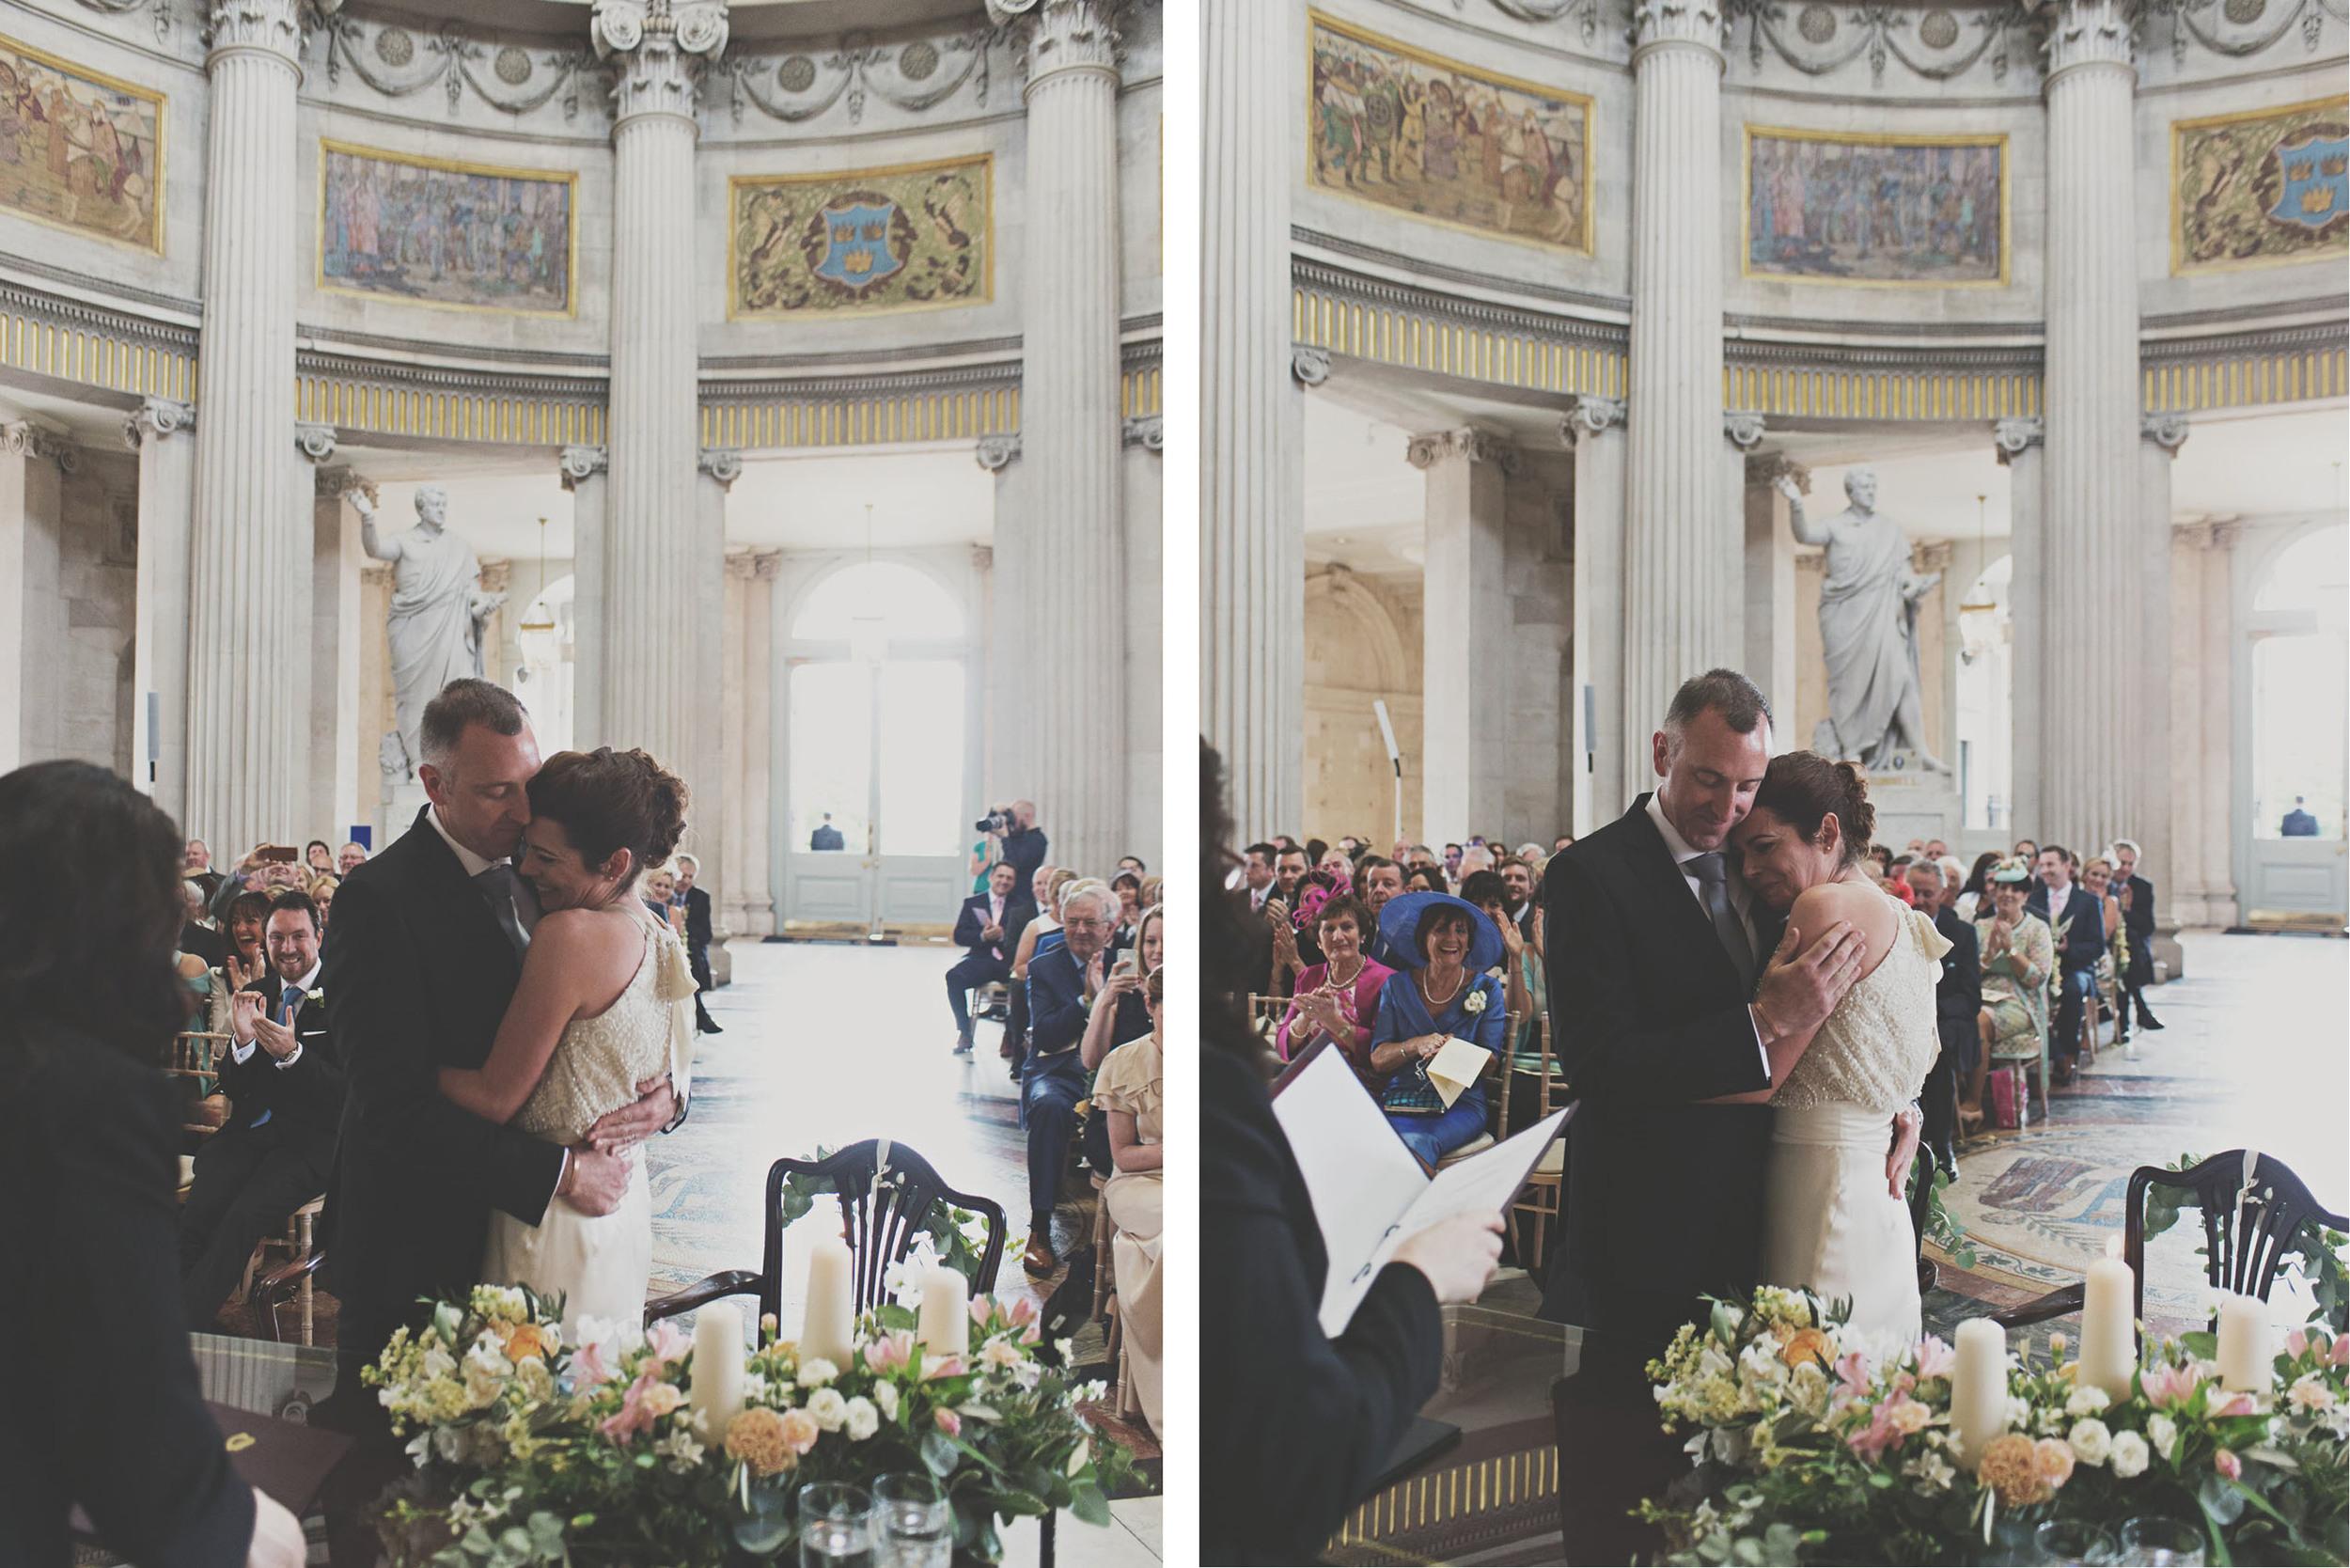 Mary & Donal's Marker Hotel Wedding 046.jpg